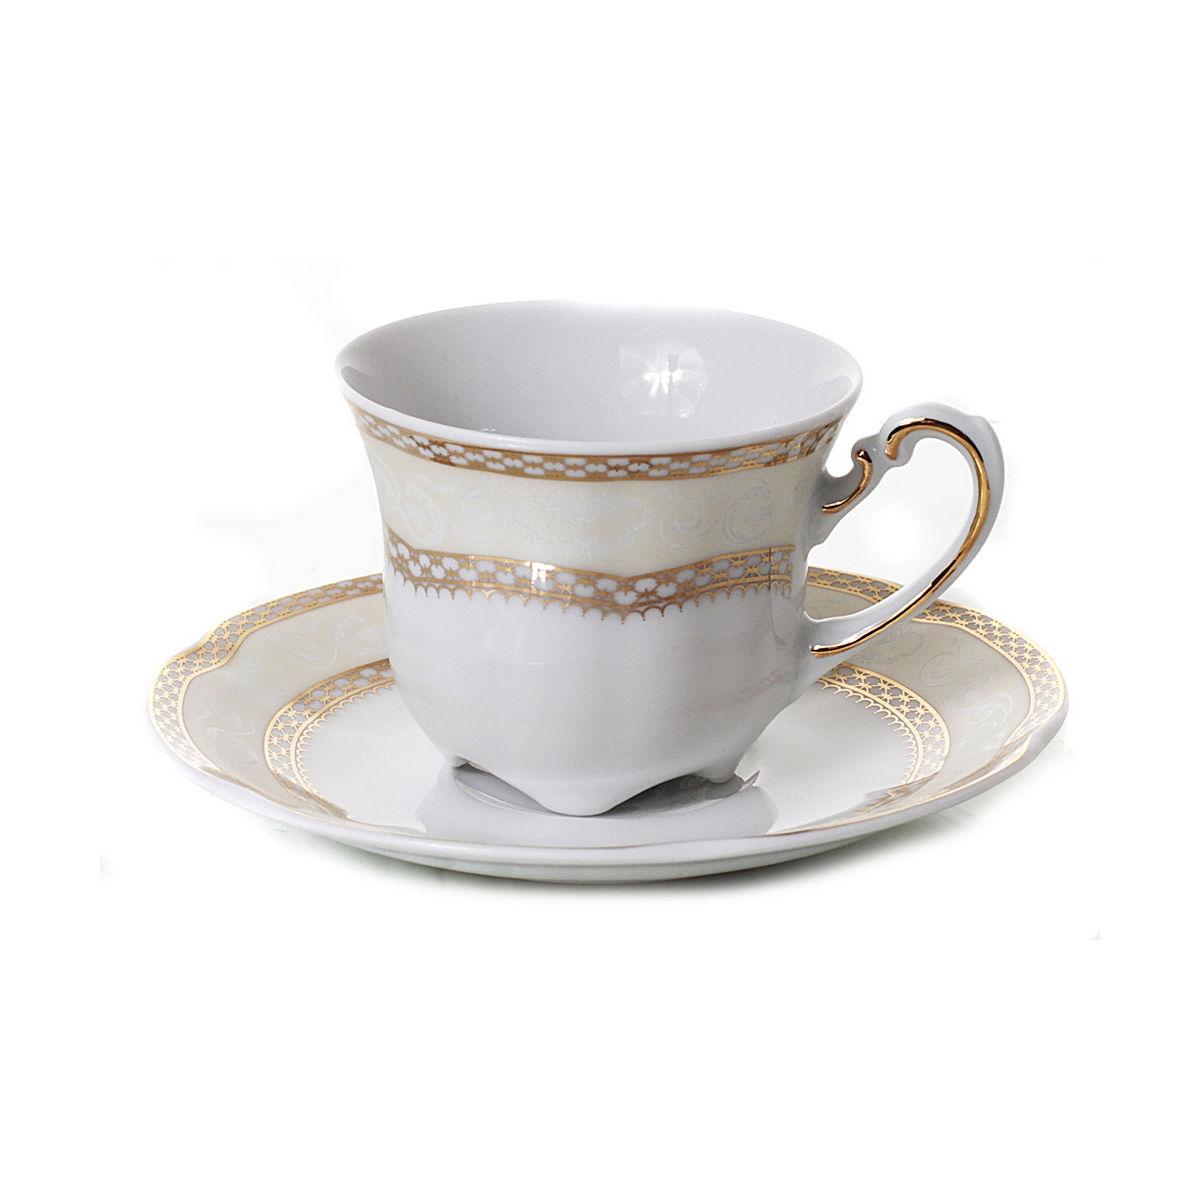 SOPHIA Serviciu cafea portelan 6 persoane 100 ml